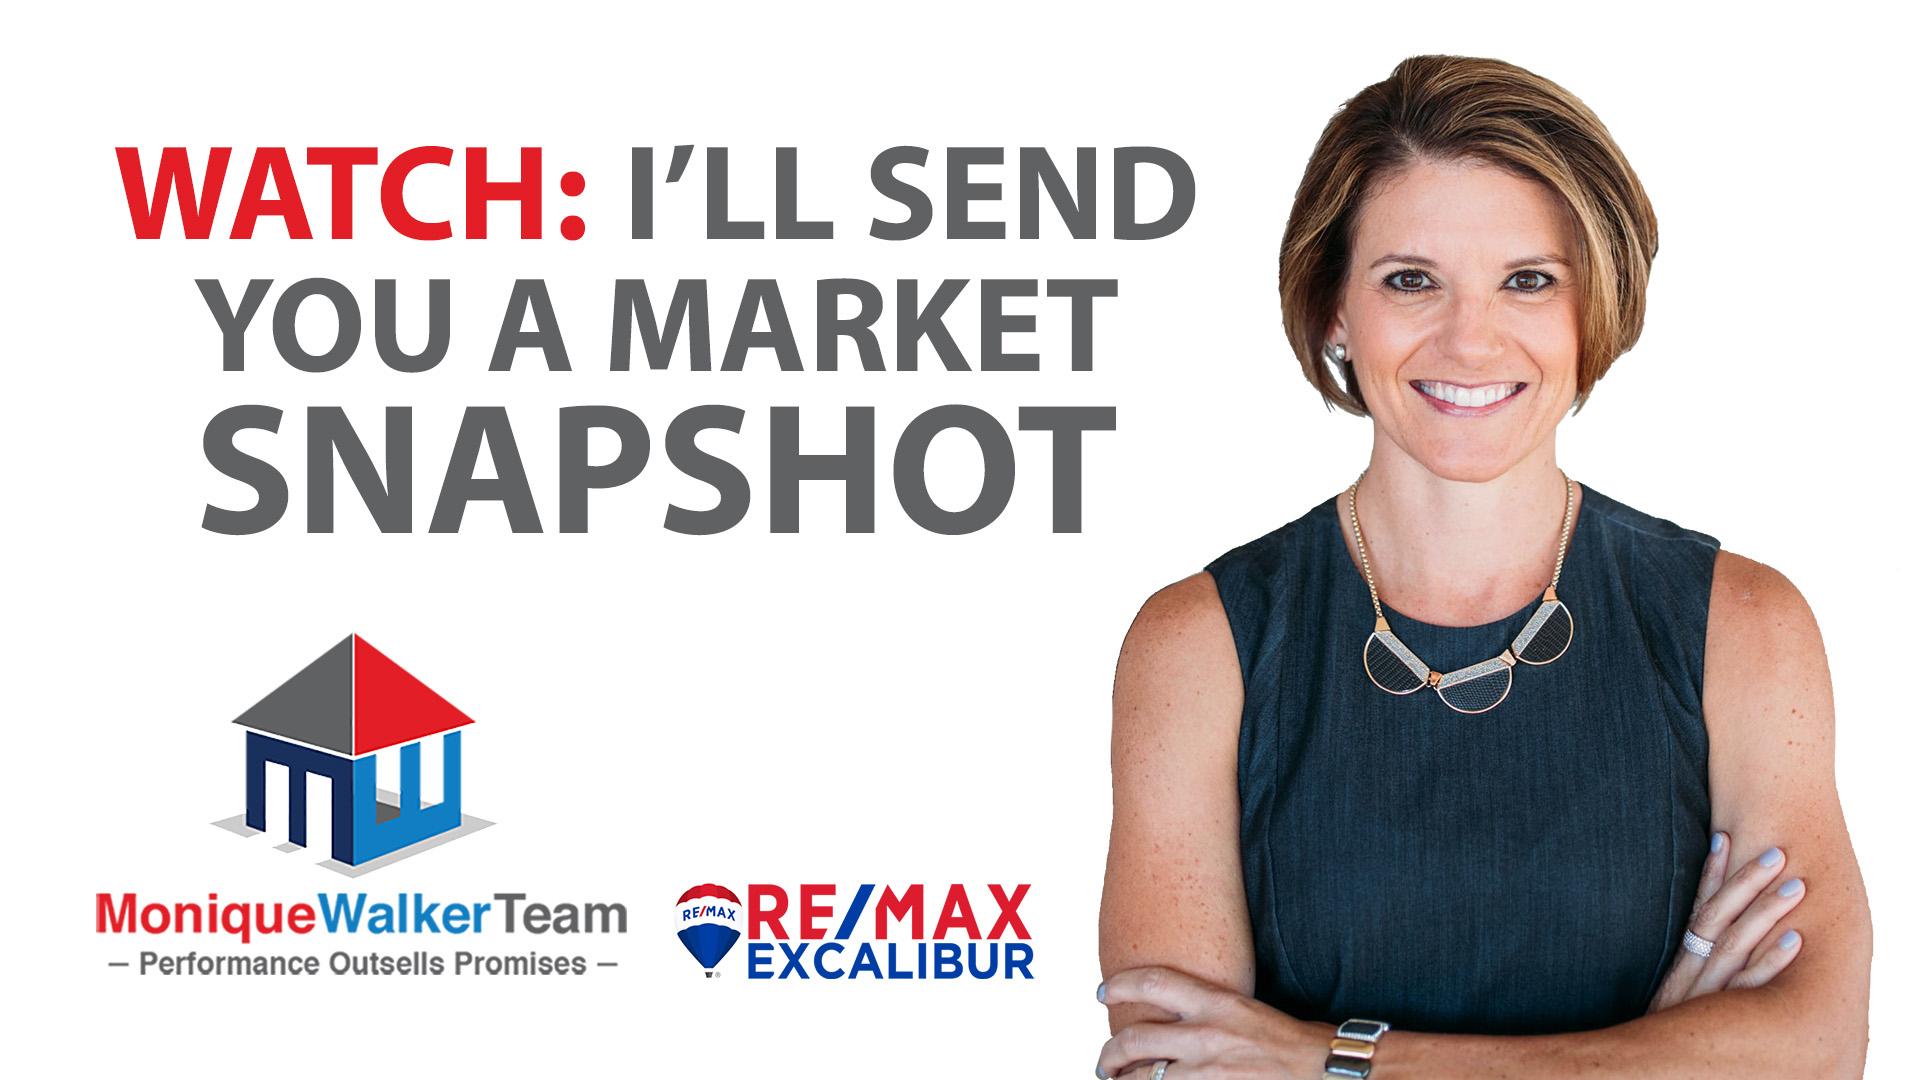 Receive a Free Market Snapshot